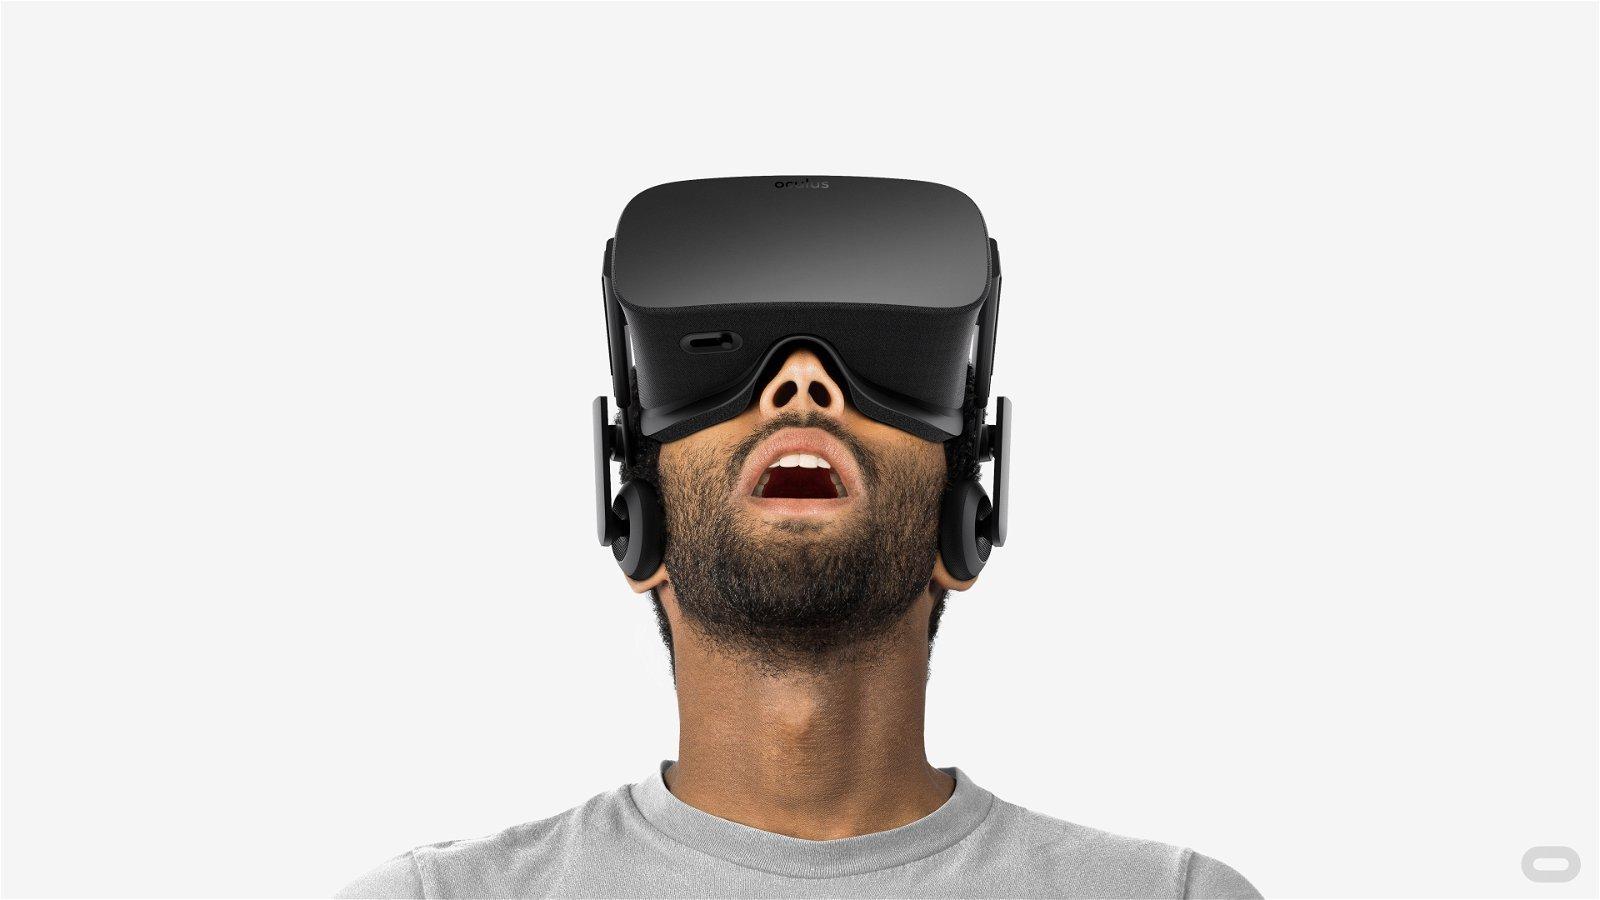 Oculus Rift (Hardware) Review 2